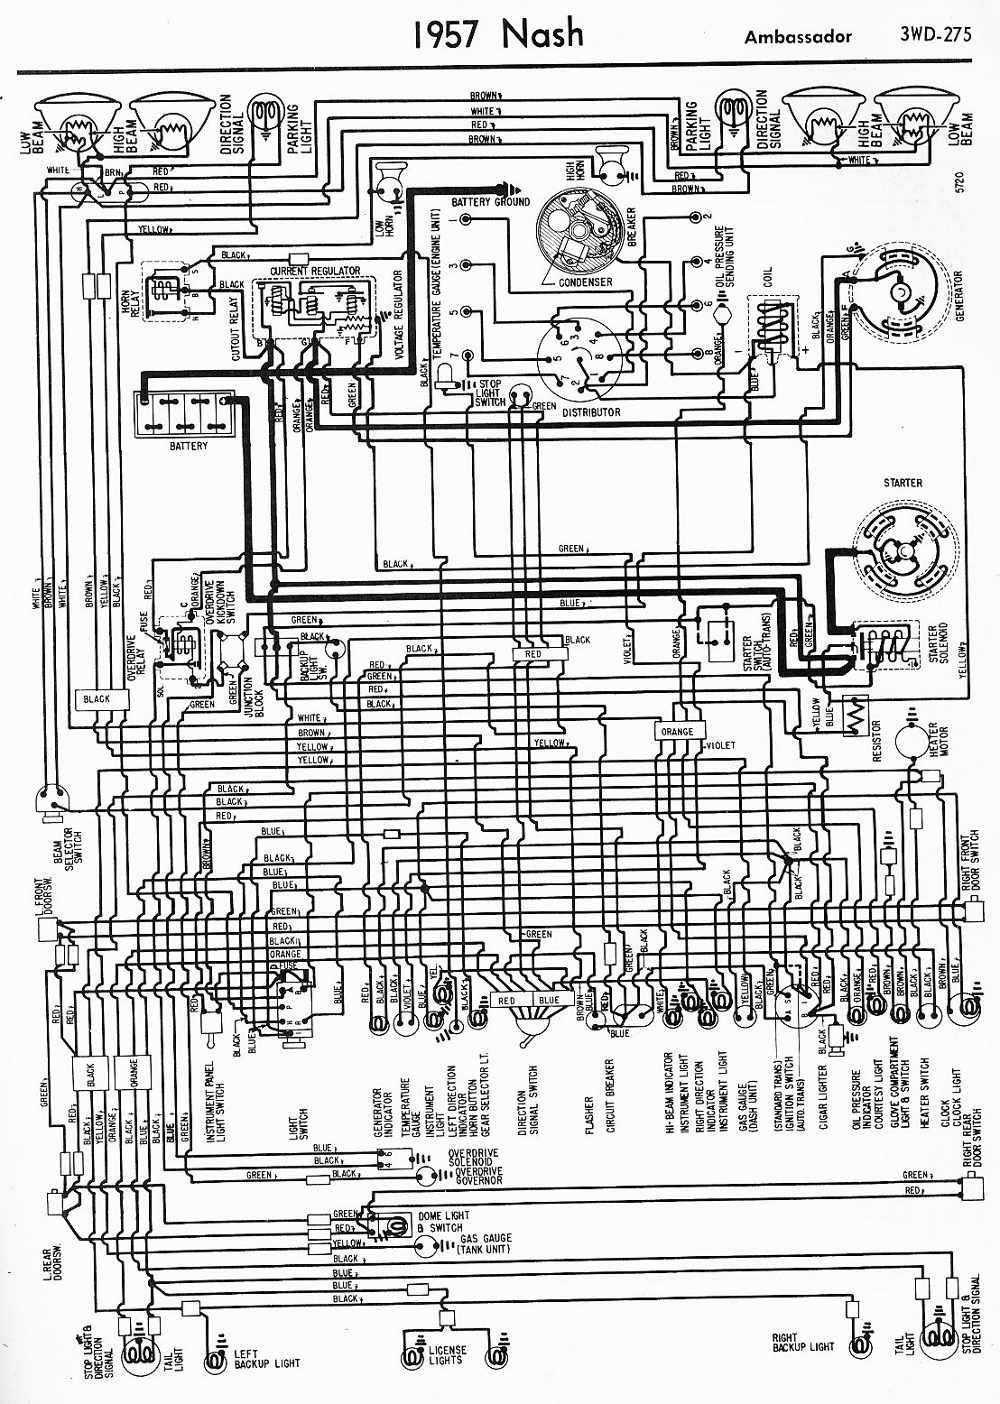 1951 oldsmobile wiring diagram nash - car manuals, wiring diagrams pdf & fault codes 1951 ford wiring diagram